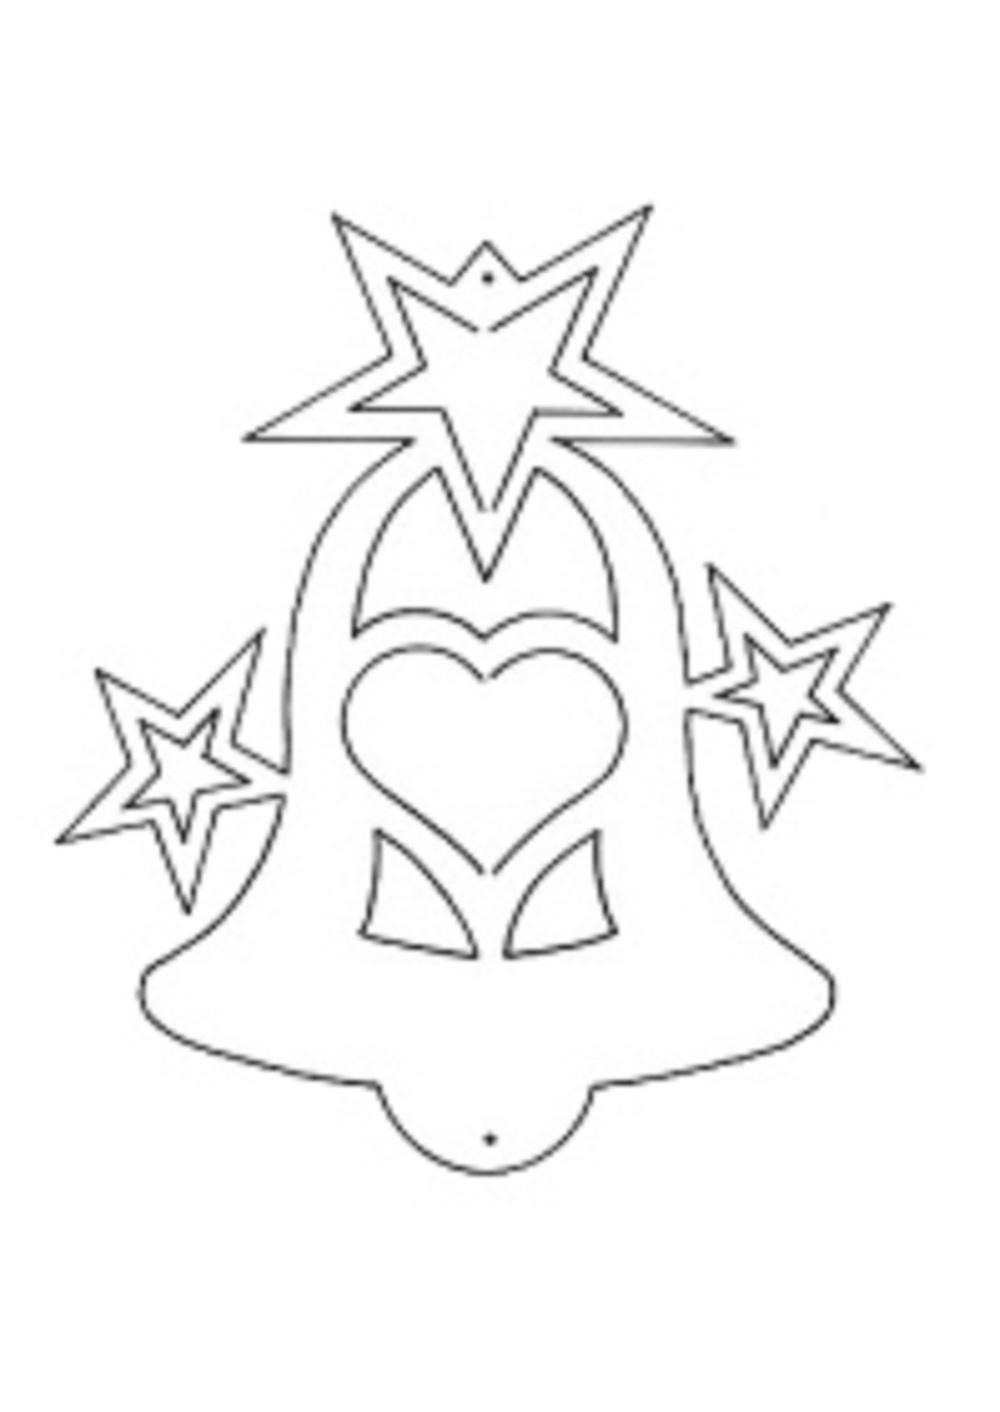 Зубная паста 5 Star Cosmetic Травяная с экстрактом Нони 25гр